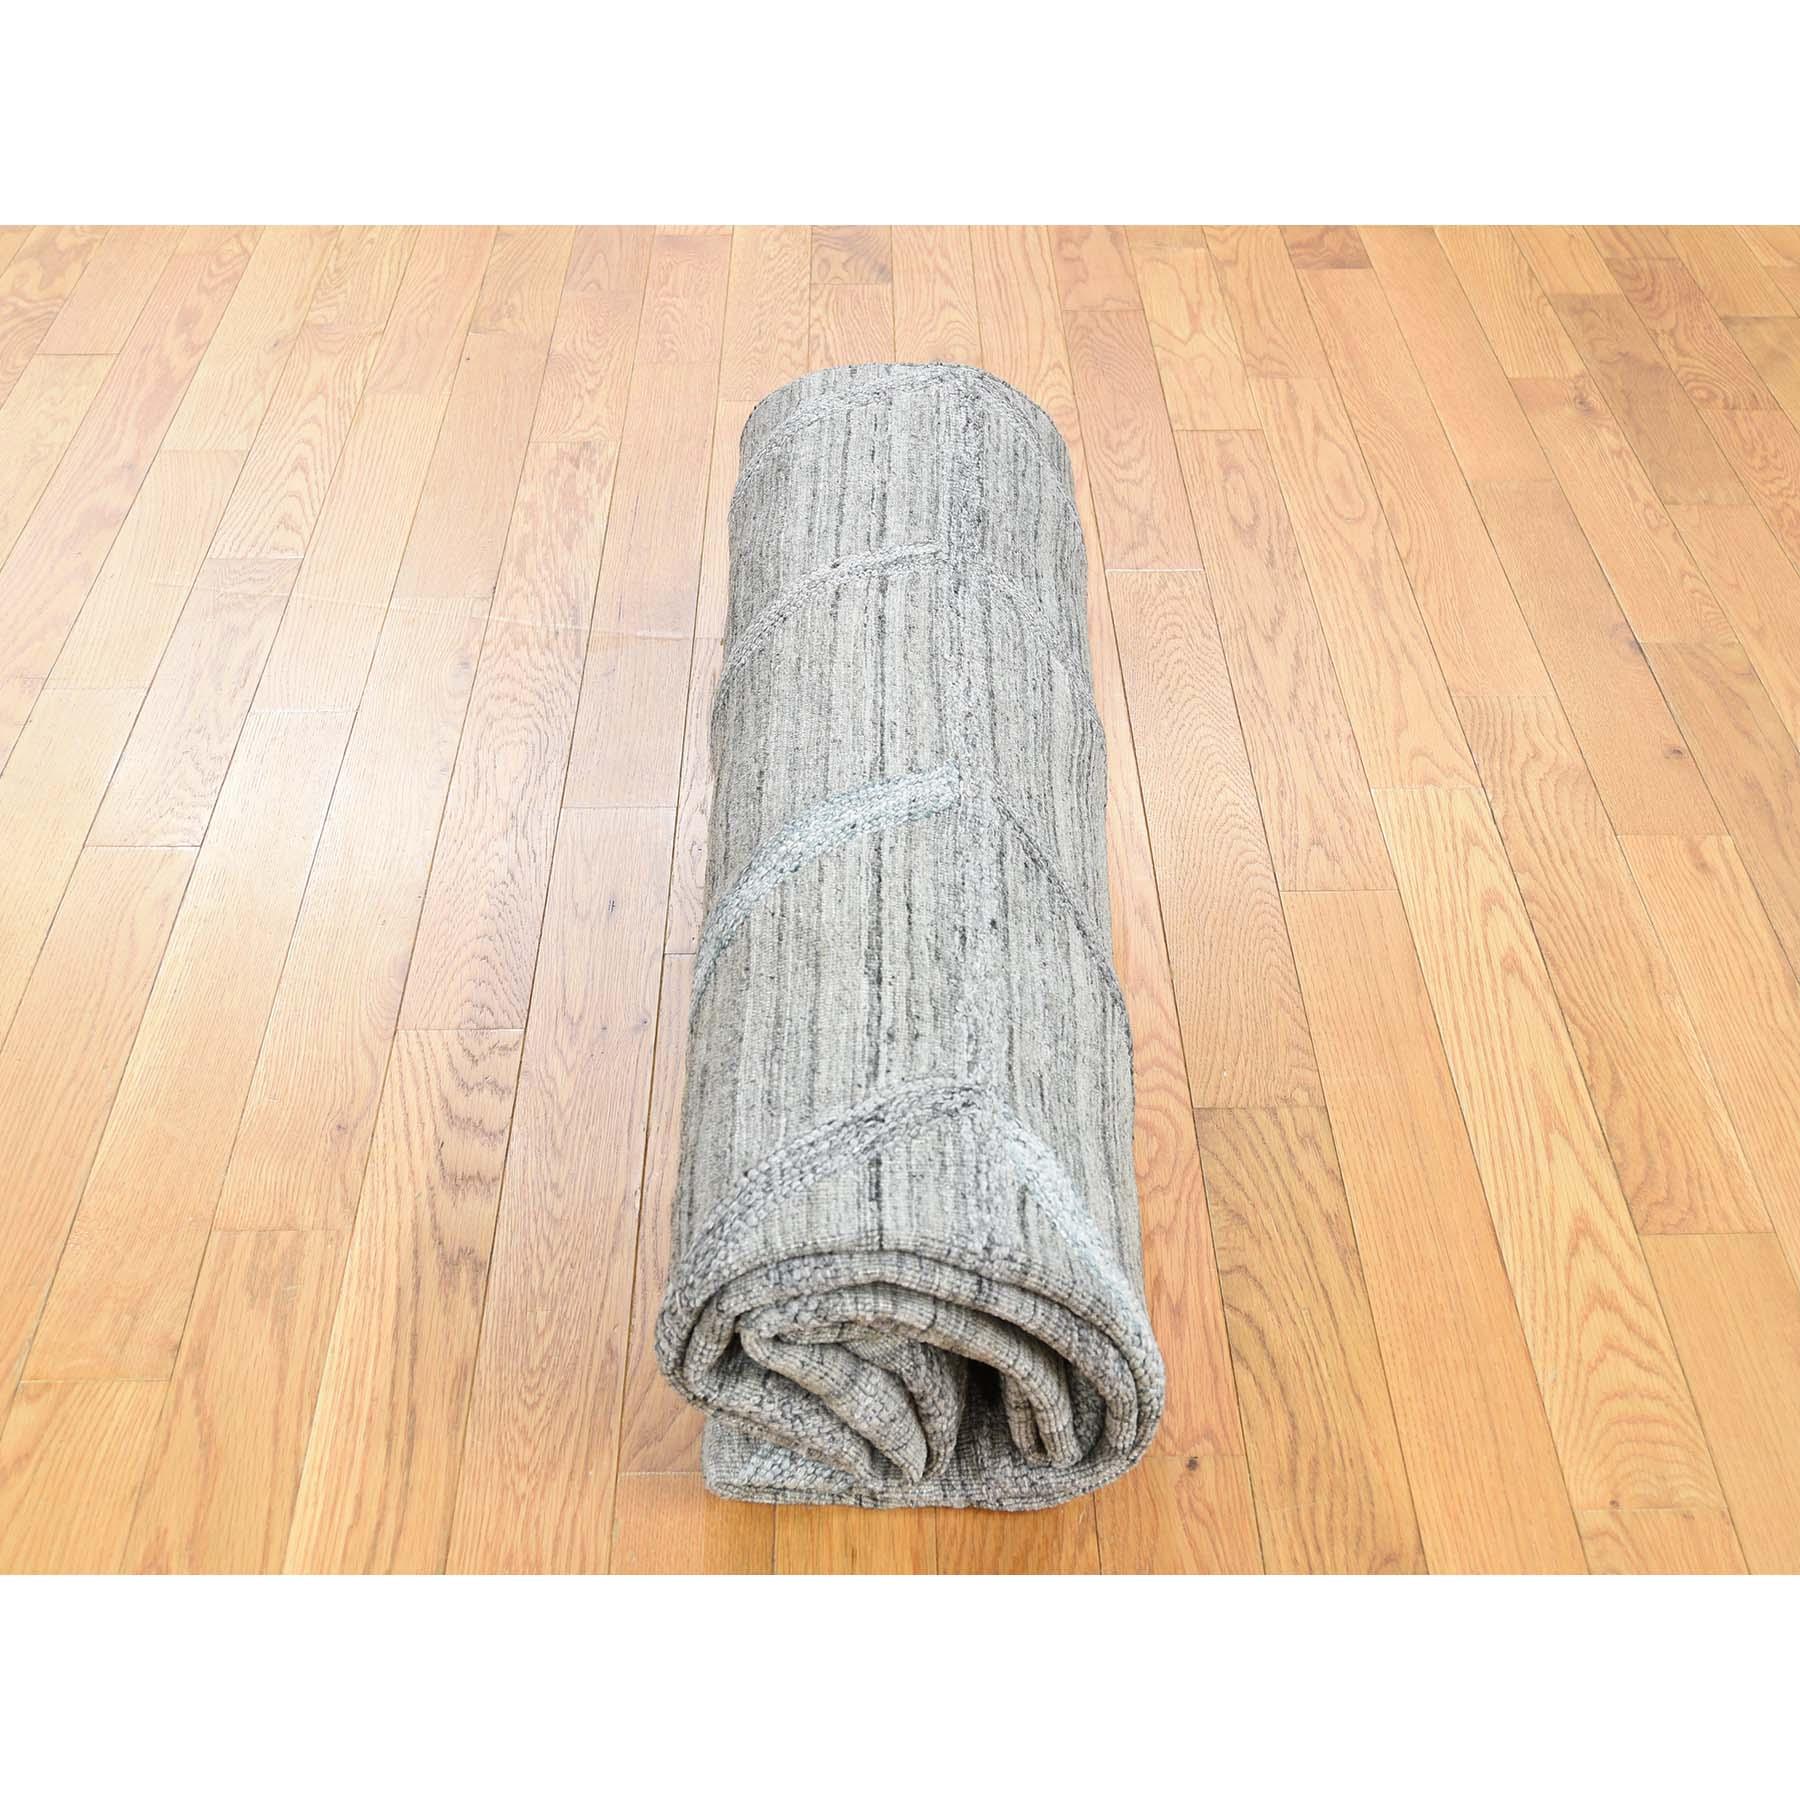 "6'x8'10"" Hand Loomed Wool and Silk Modern Arrow Design Grey Hi-Lo Pile Rug"